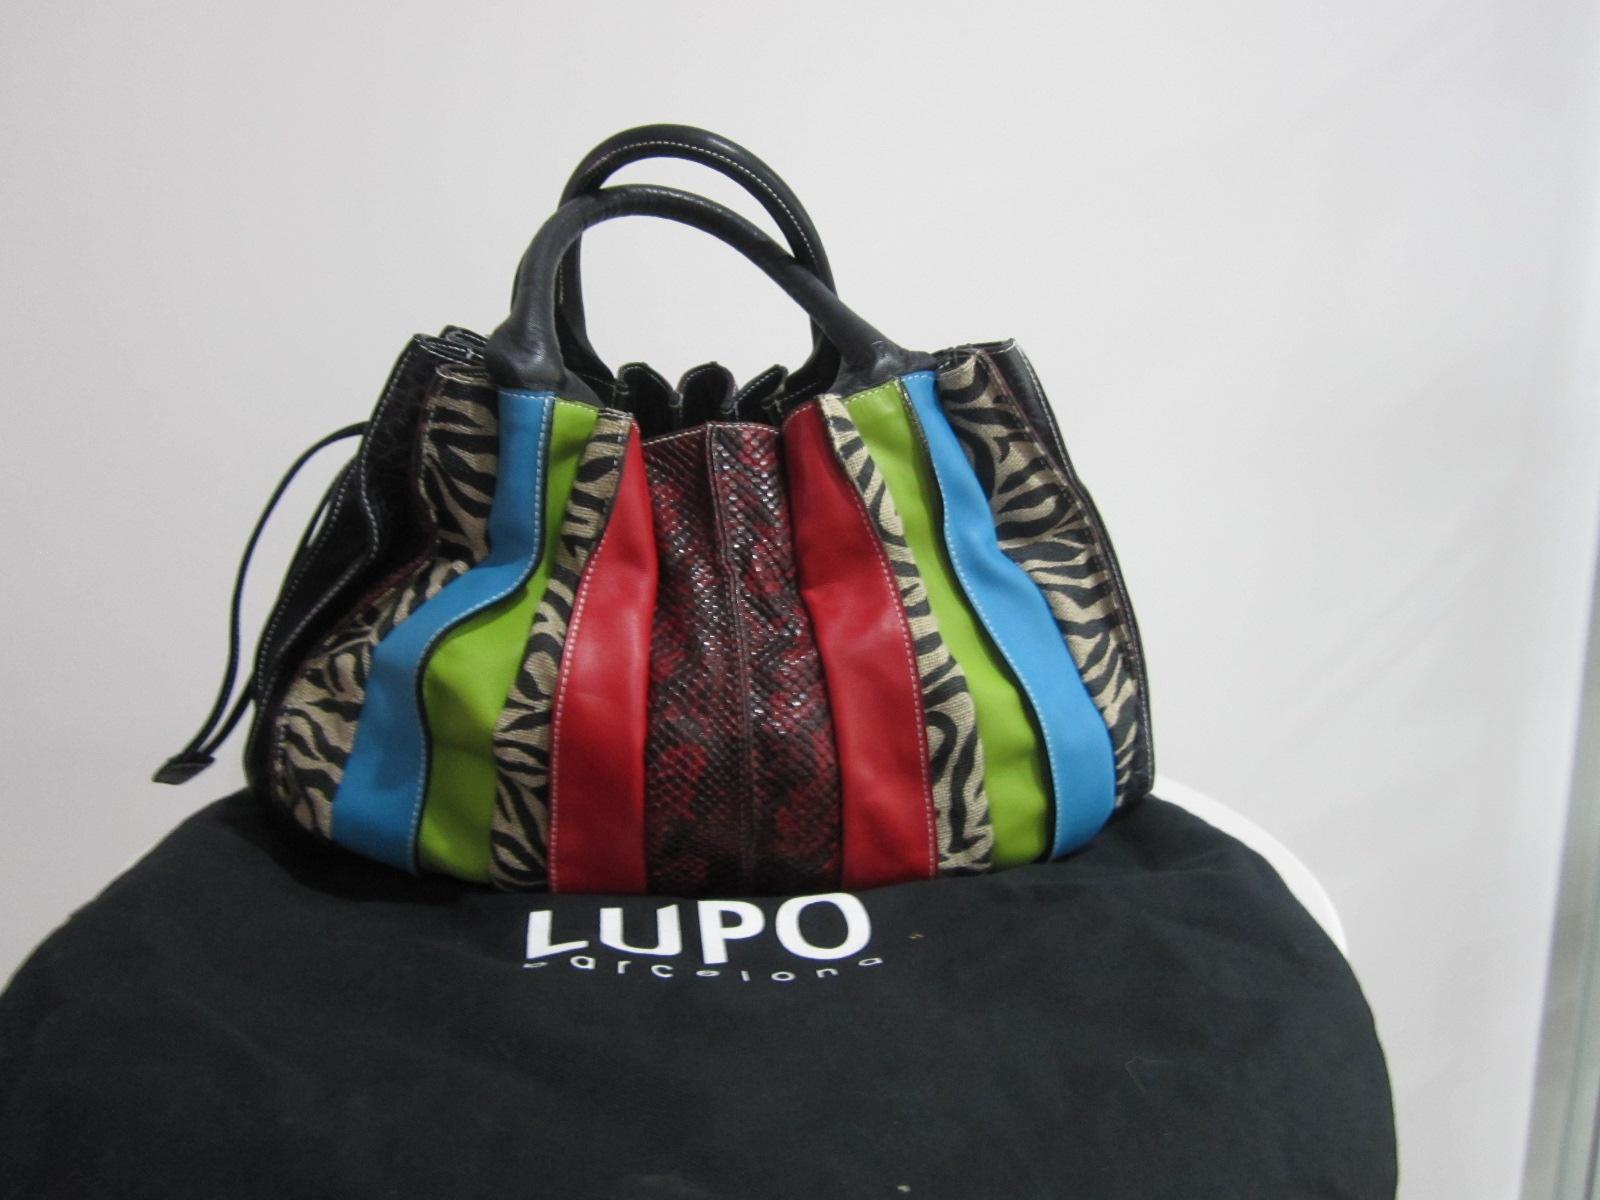 http://1.bp.blogspot.com/-Tglj1kxtWlY/T9x0eeofnOI/AAAAAAAATqk/poMOdutO8Lc/s1600/Chanel+designer+handbags+%252821%2529.jpg